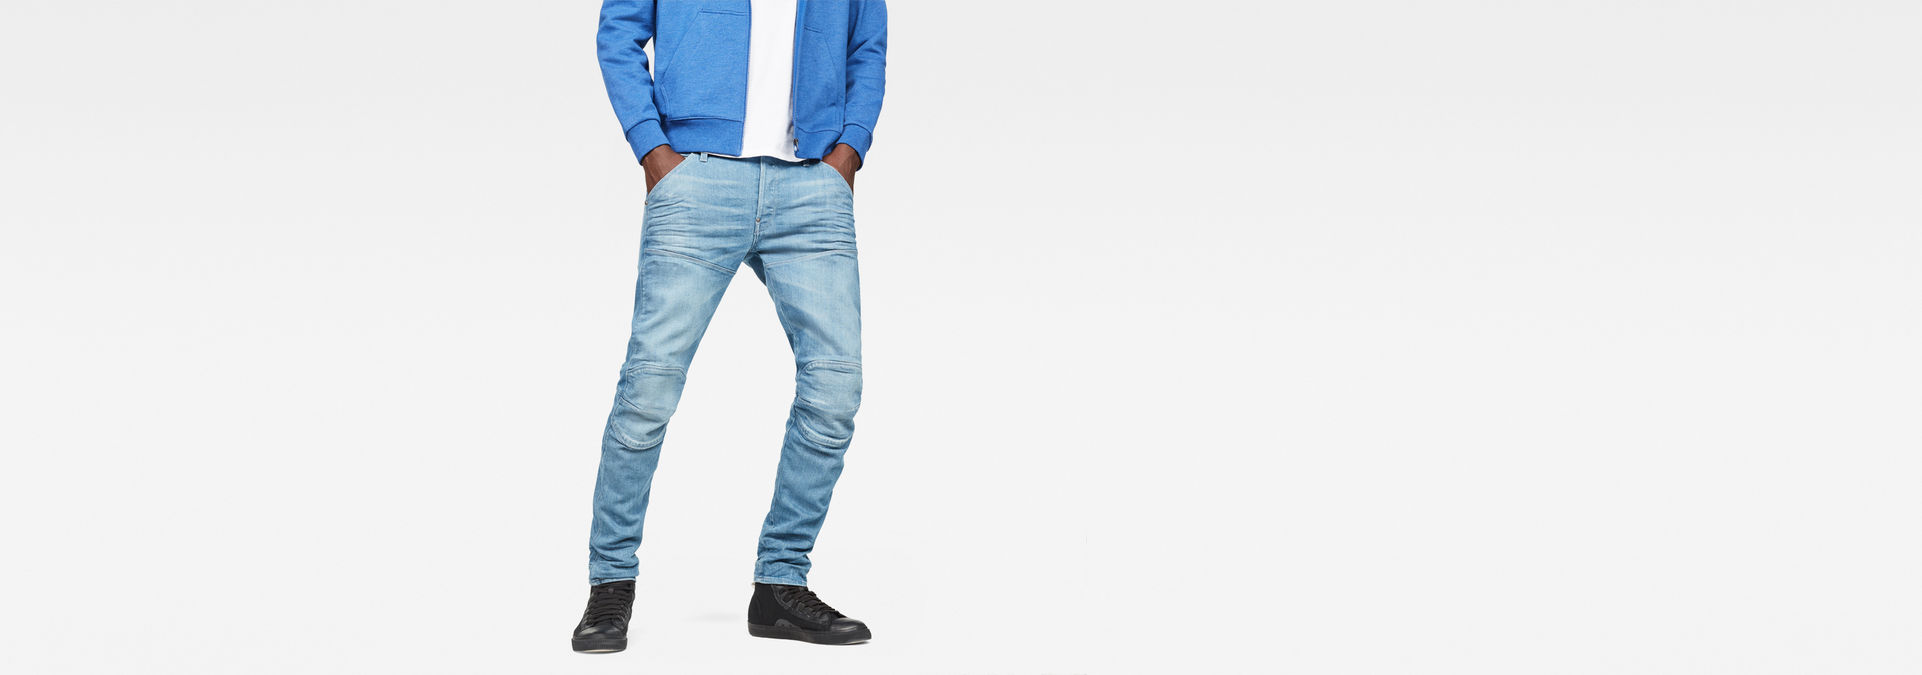 5620 G Star Elwood 3D Slim Jeans | Medium Aged | G Star RAW®